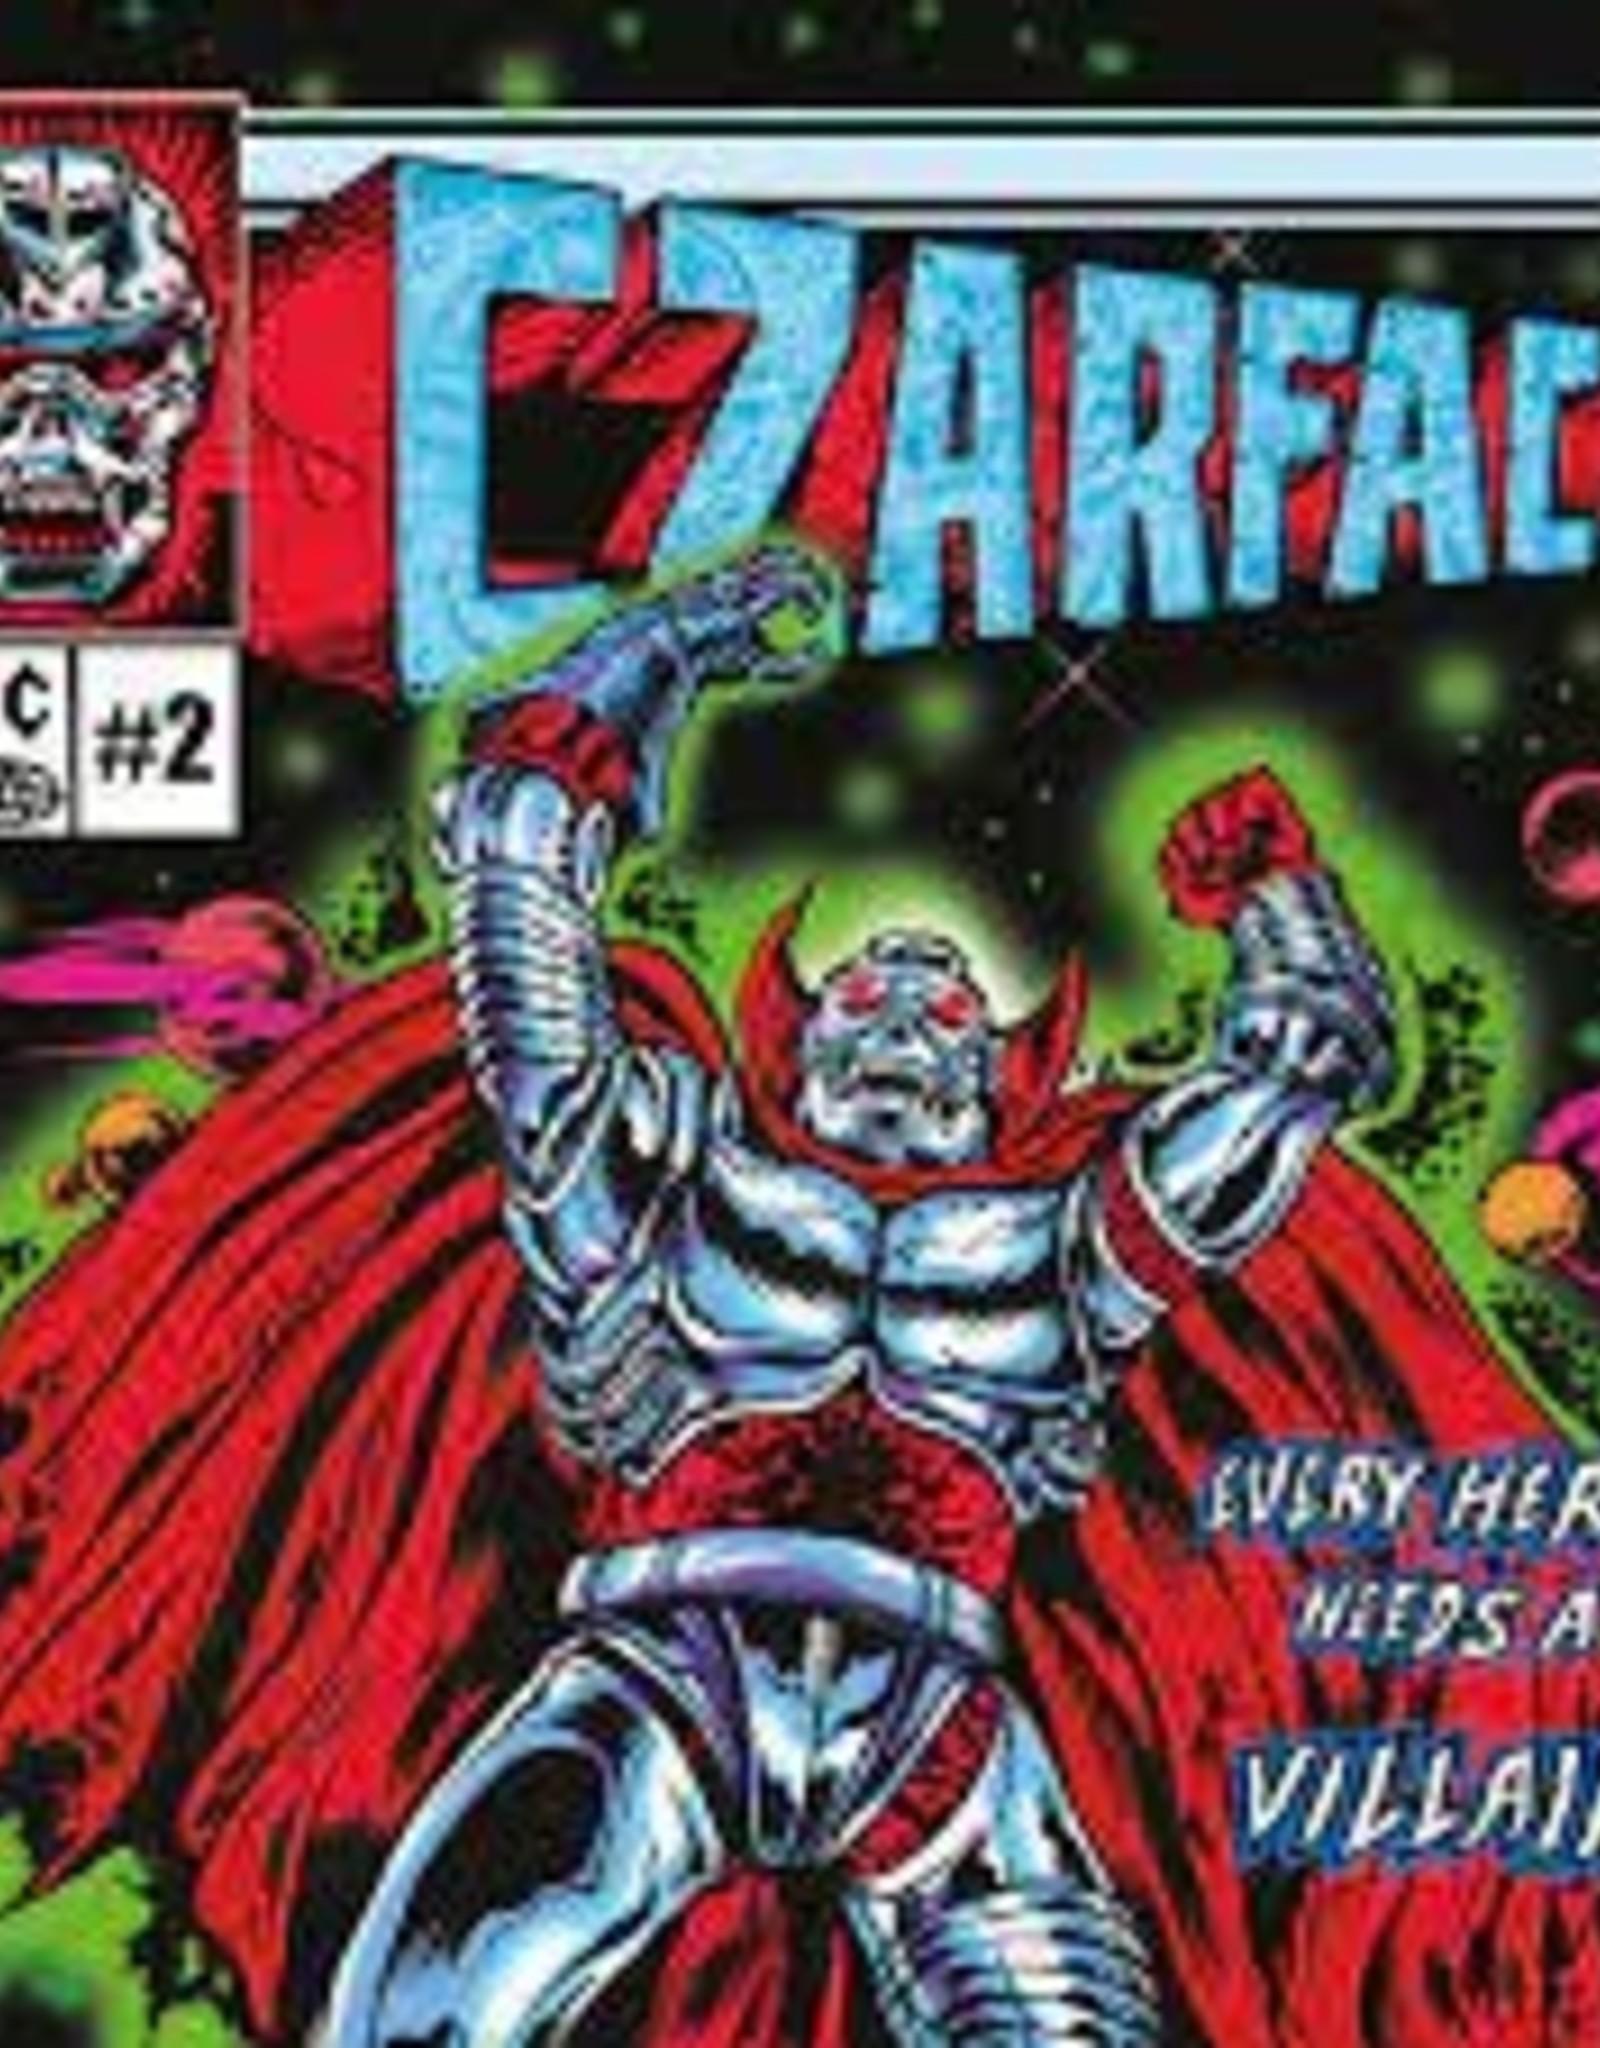 Czarface  - Every Hero Needs A Villain